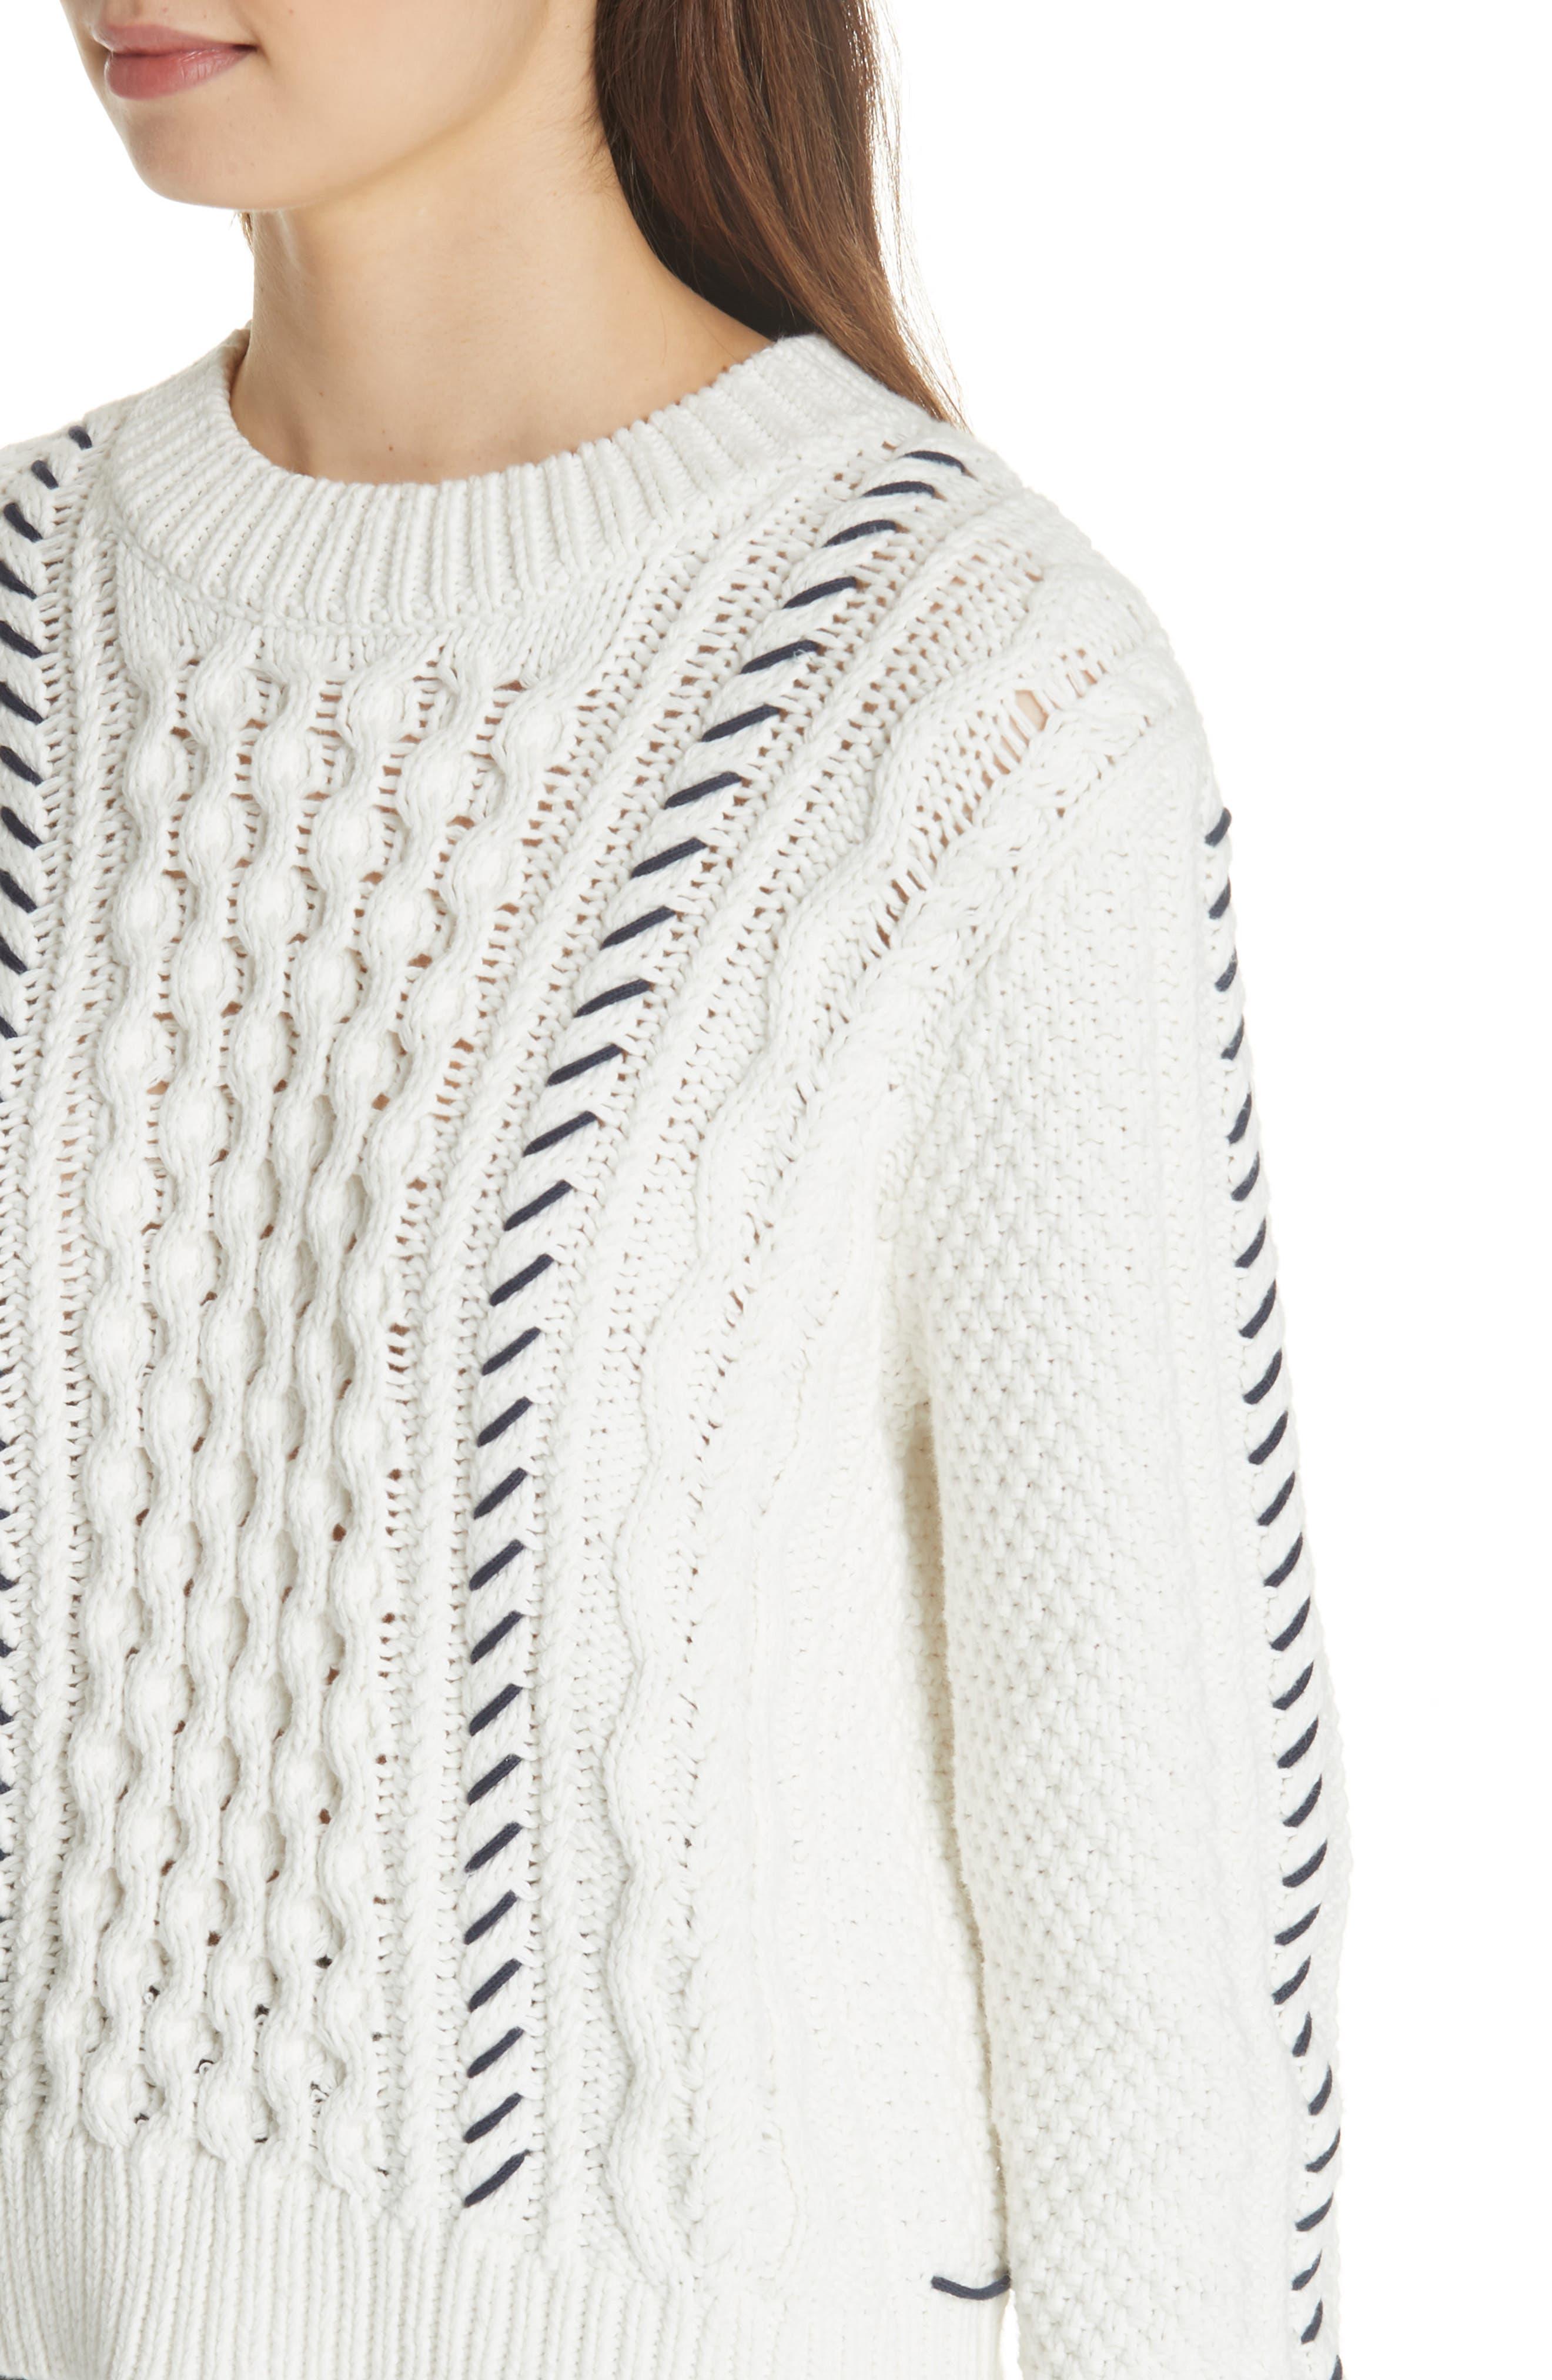 Cotton Fisherman Sweater,                             Alternate thumbnail 4, color,                             WHITE NAVY